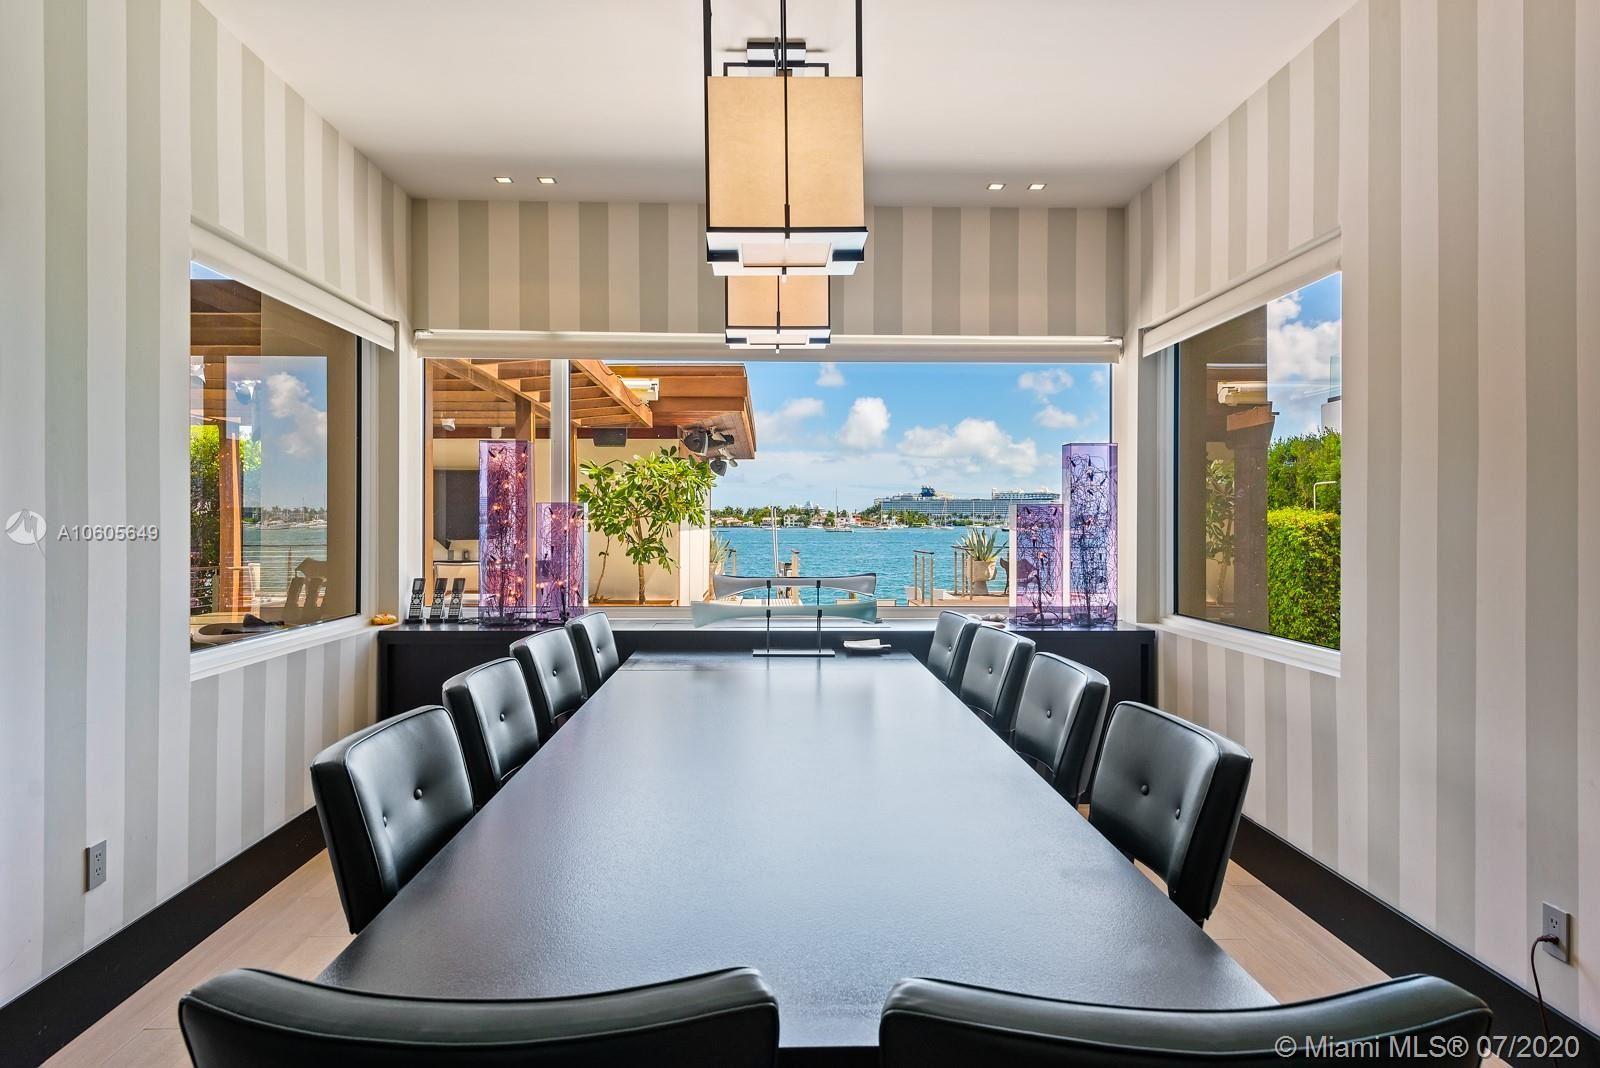 Photo 6 of Listing MLS a10605649 in 1376 S Venetian Way Miami FL 33139